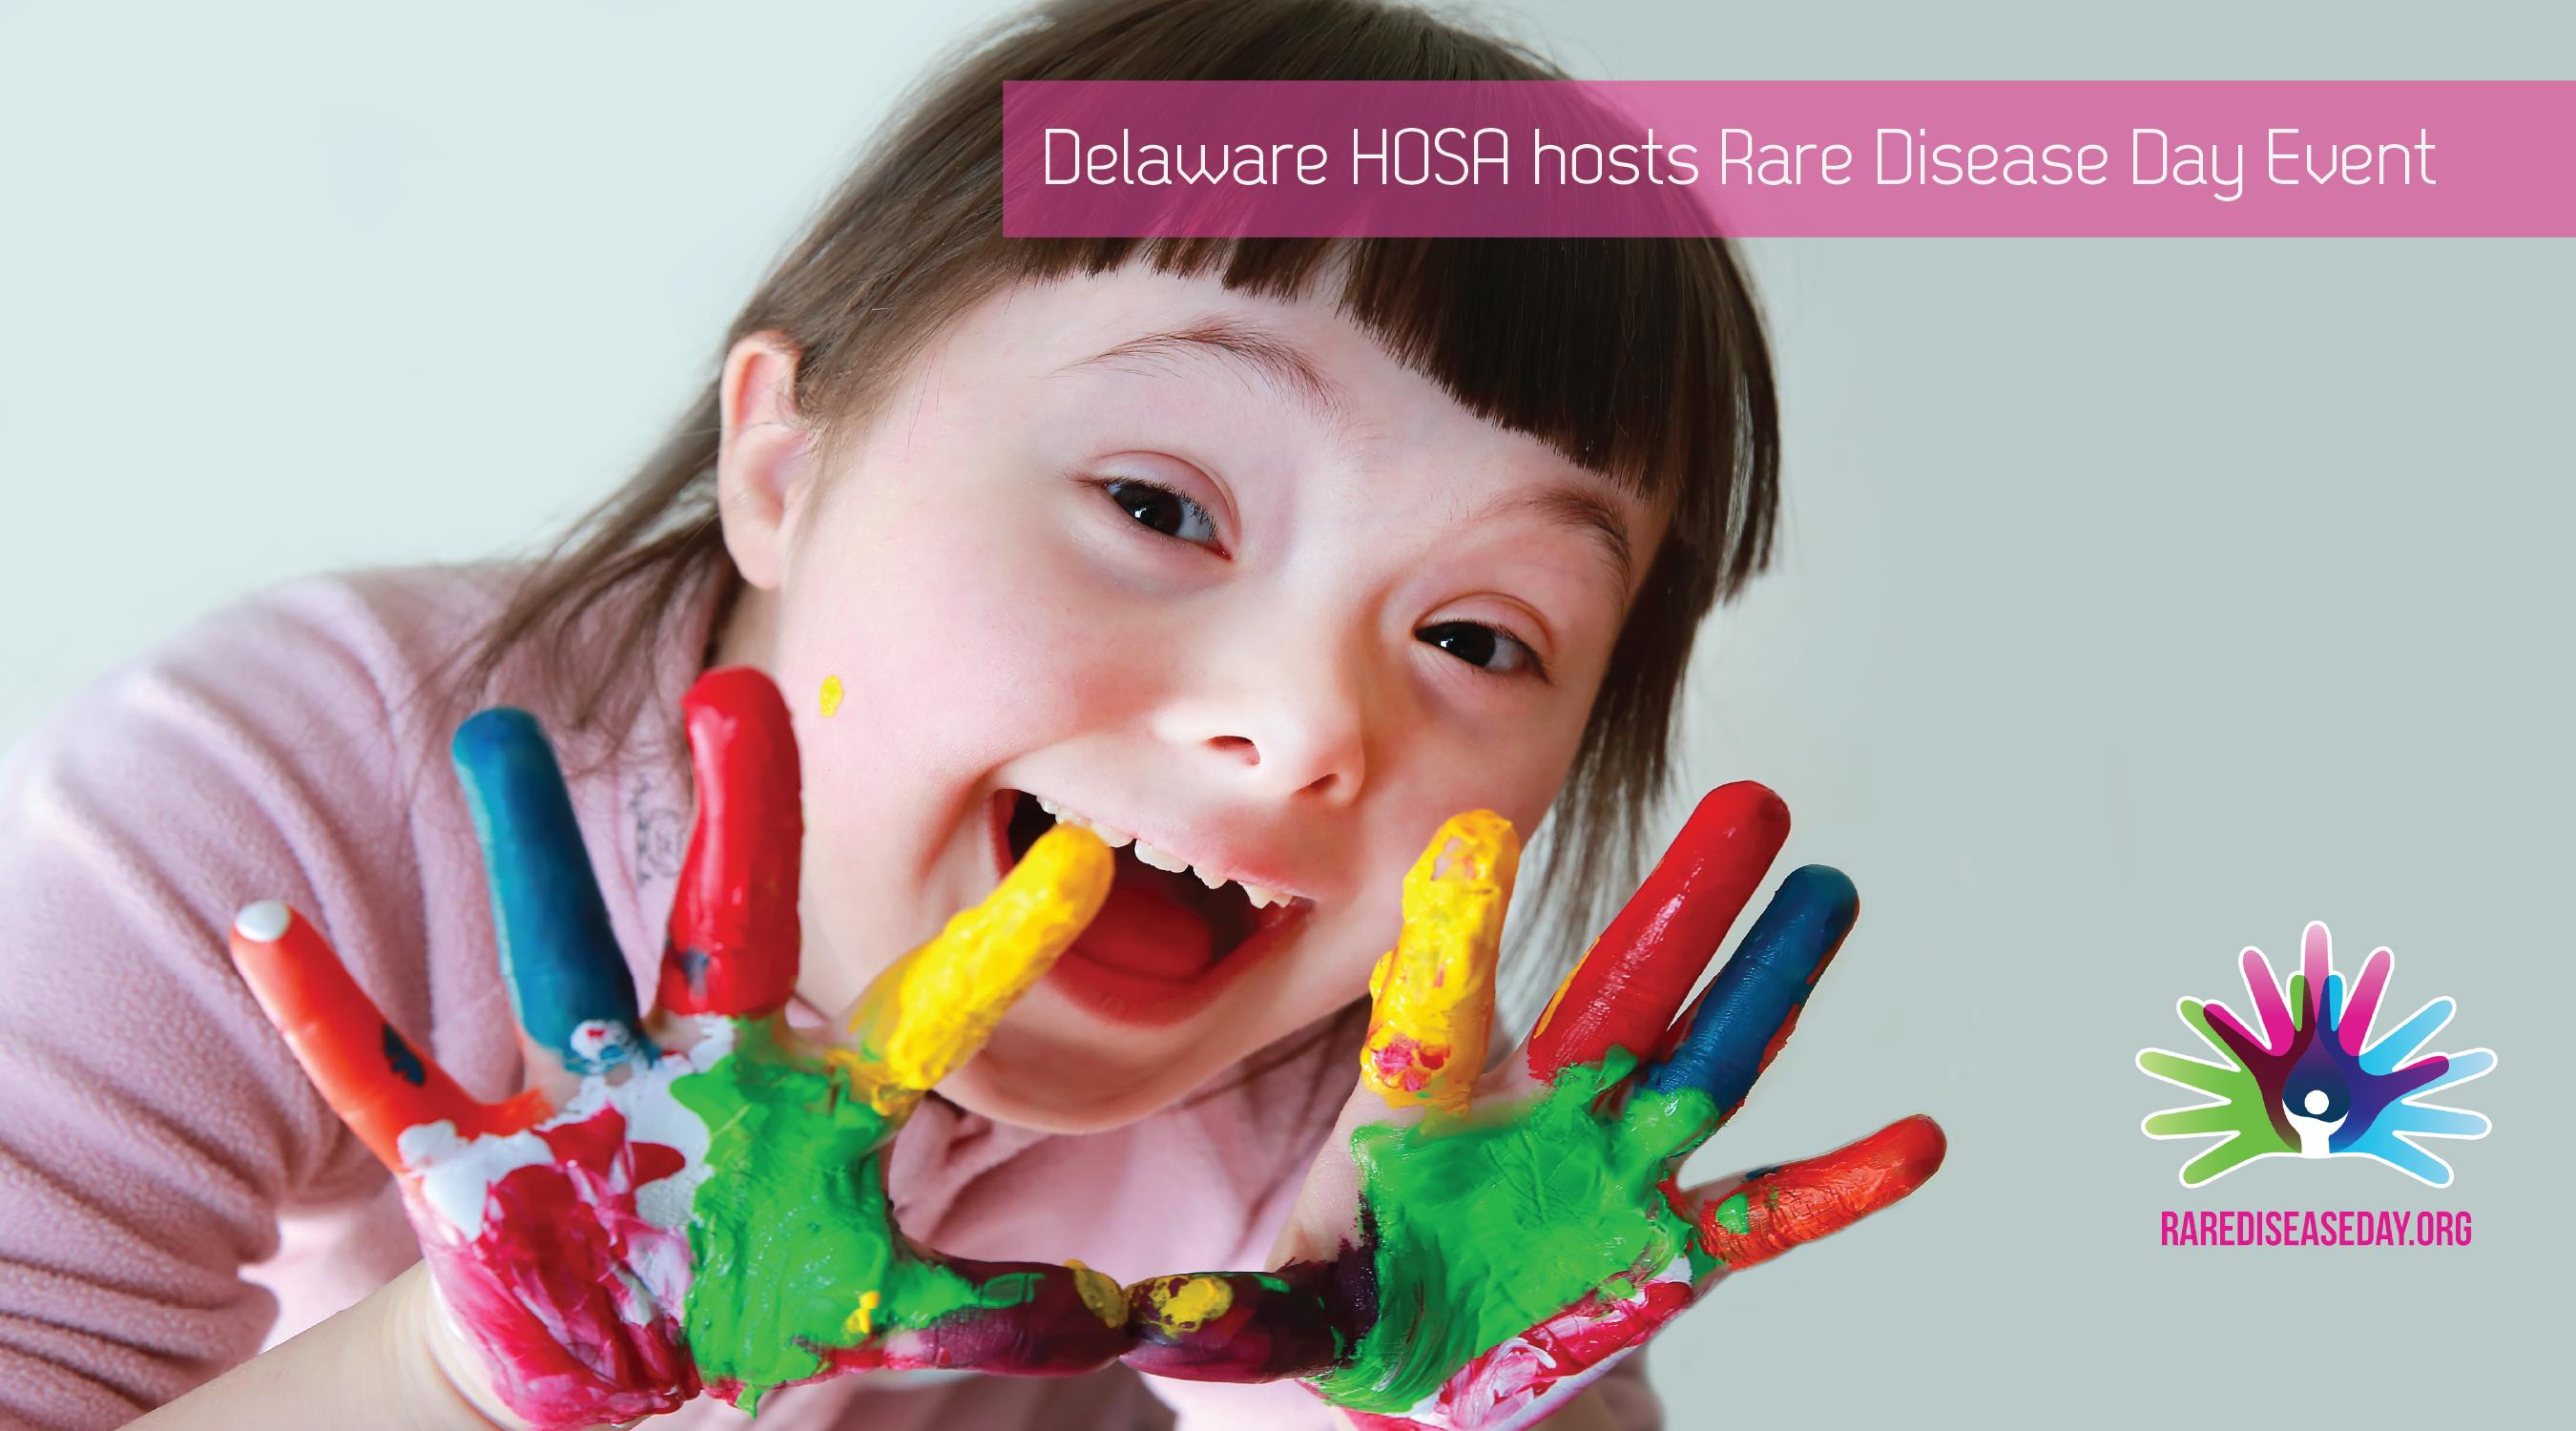 Delaware HOSA Hosts Rare Disease Day Event